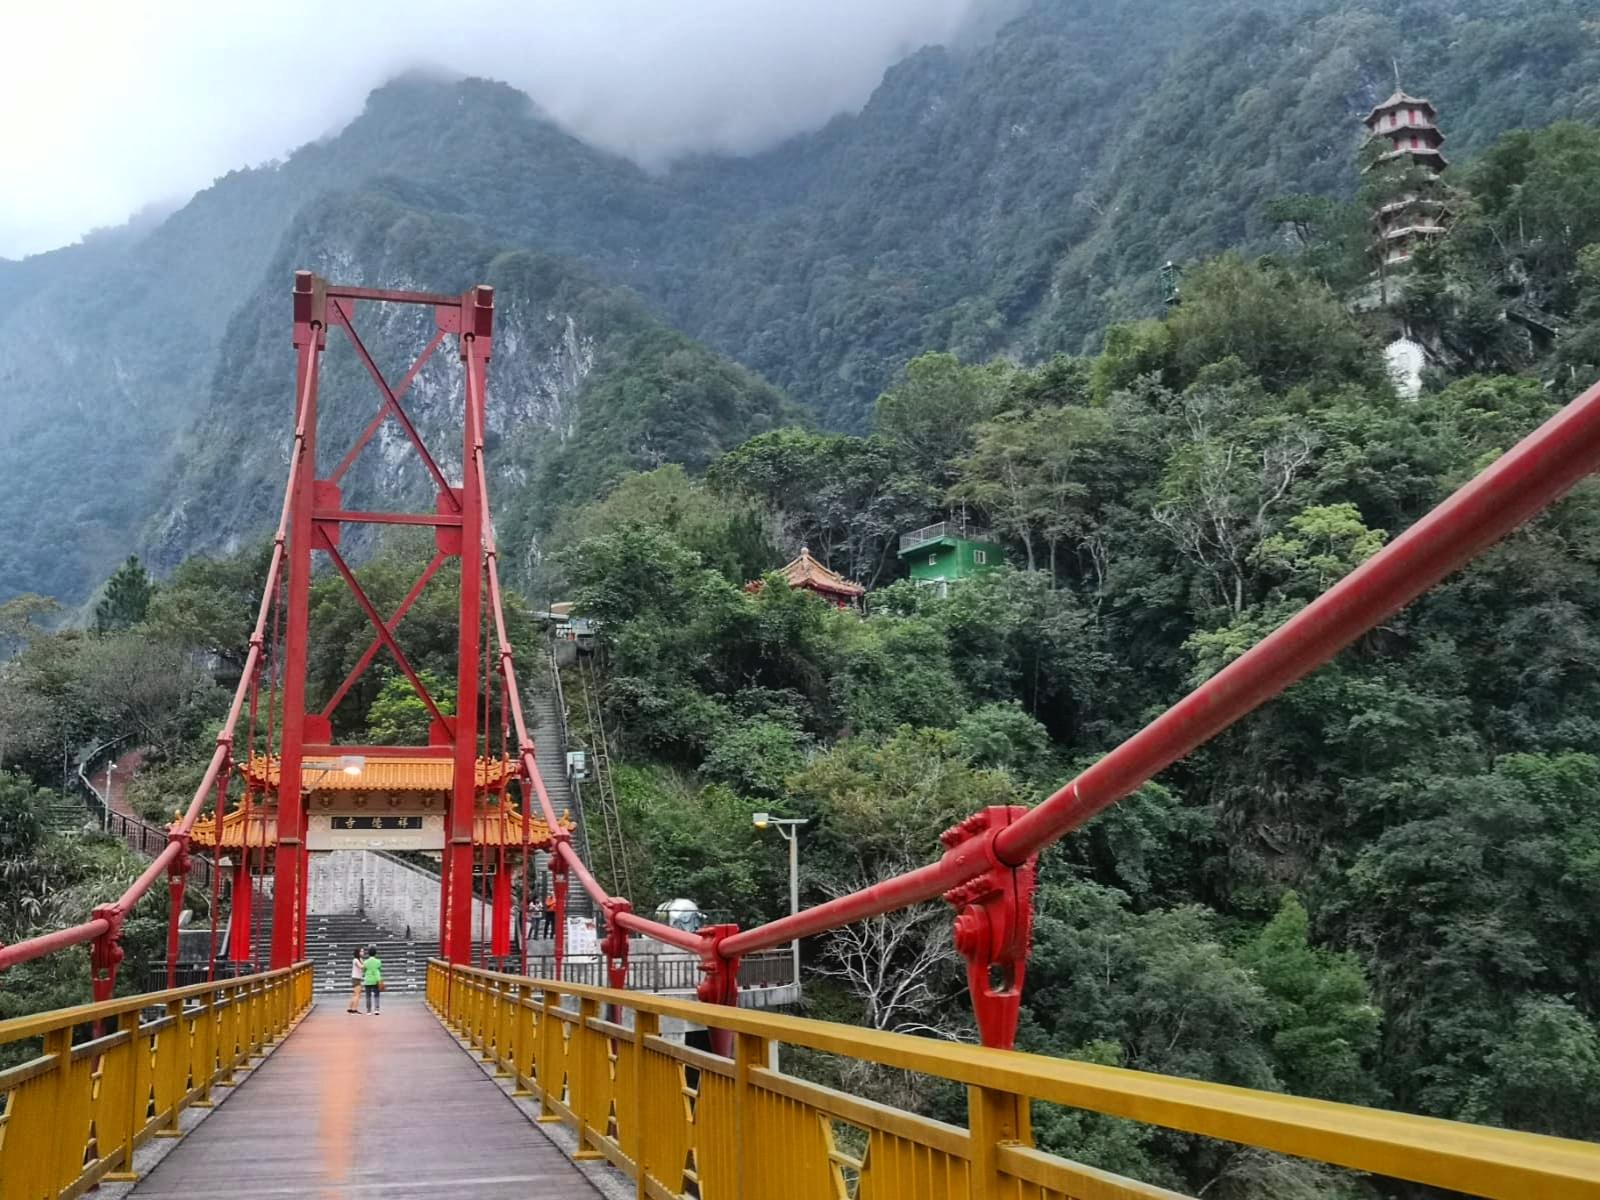 Temple in mountains Hua Lien Taiwan